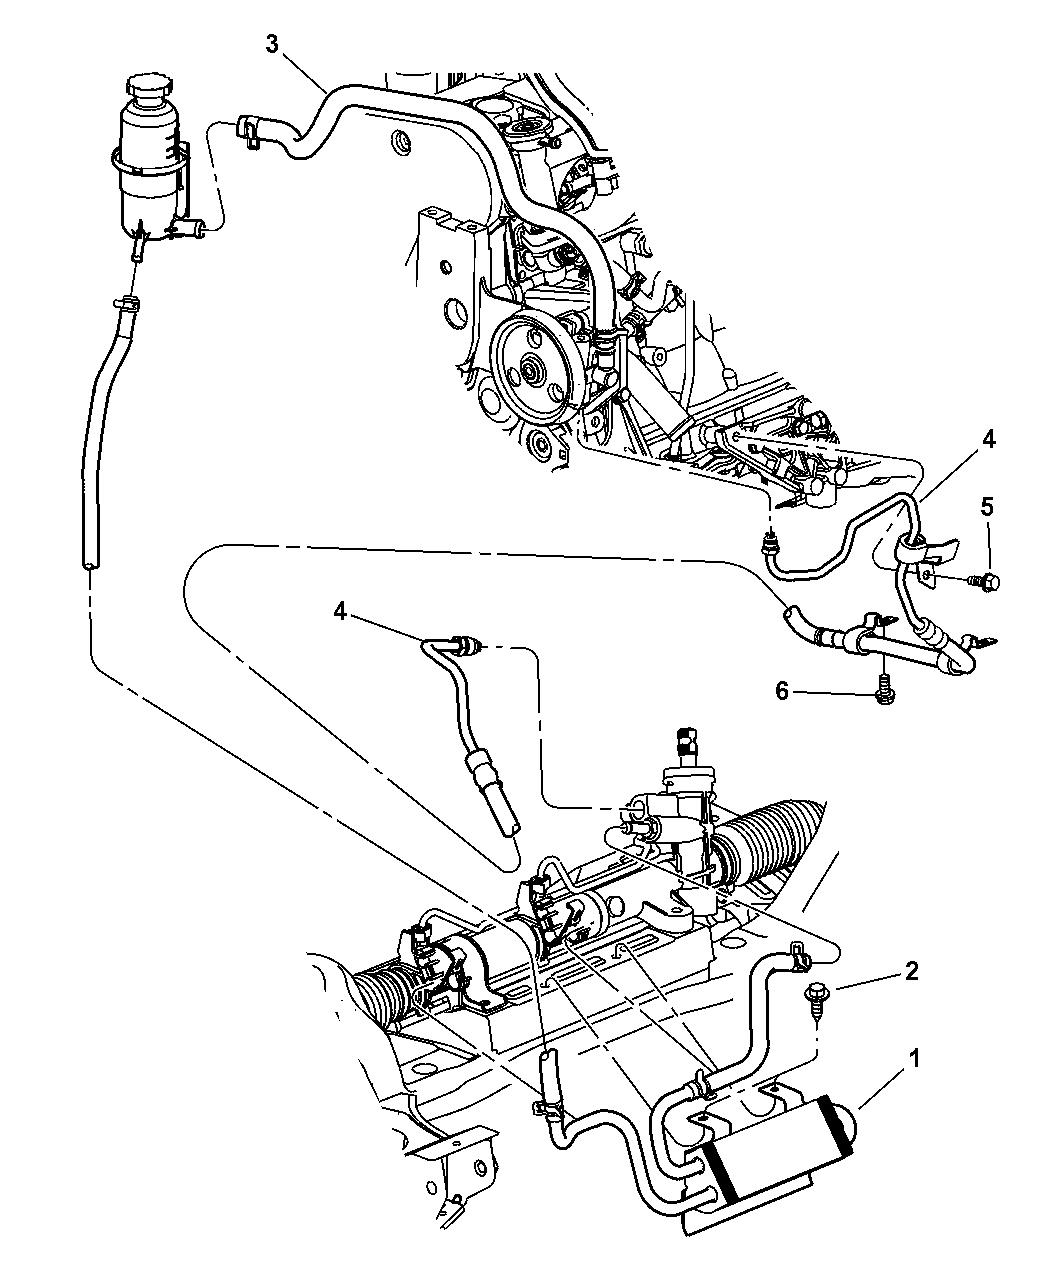 2003 Chevy Trailblazer Power Steering Lines Diagram